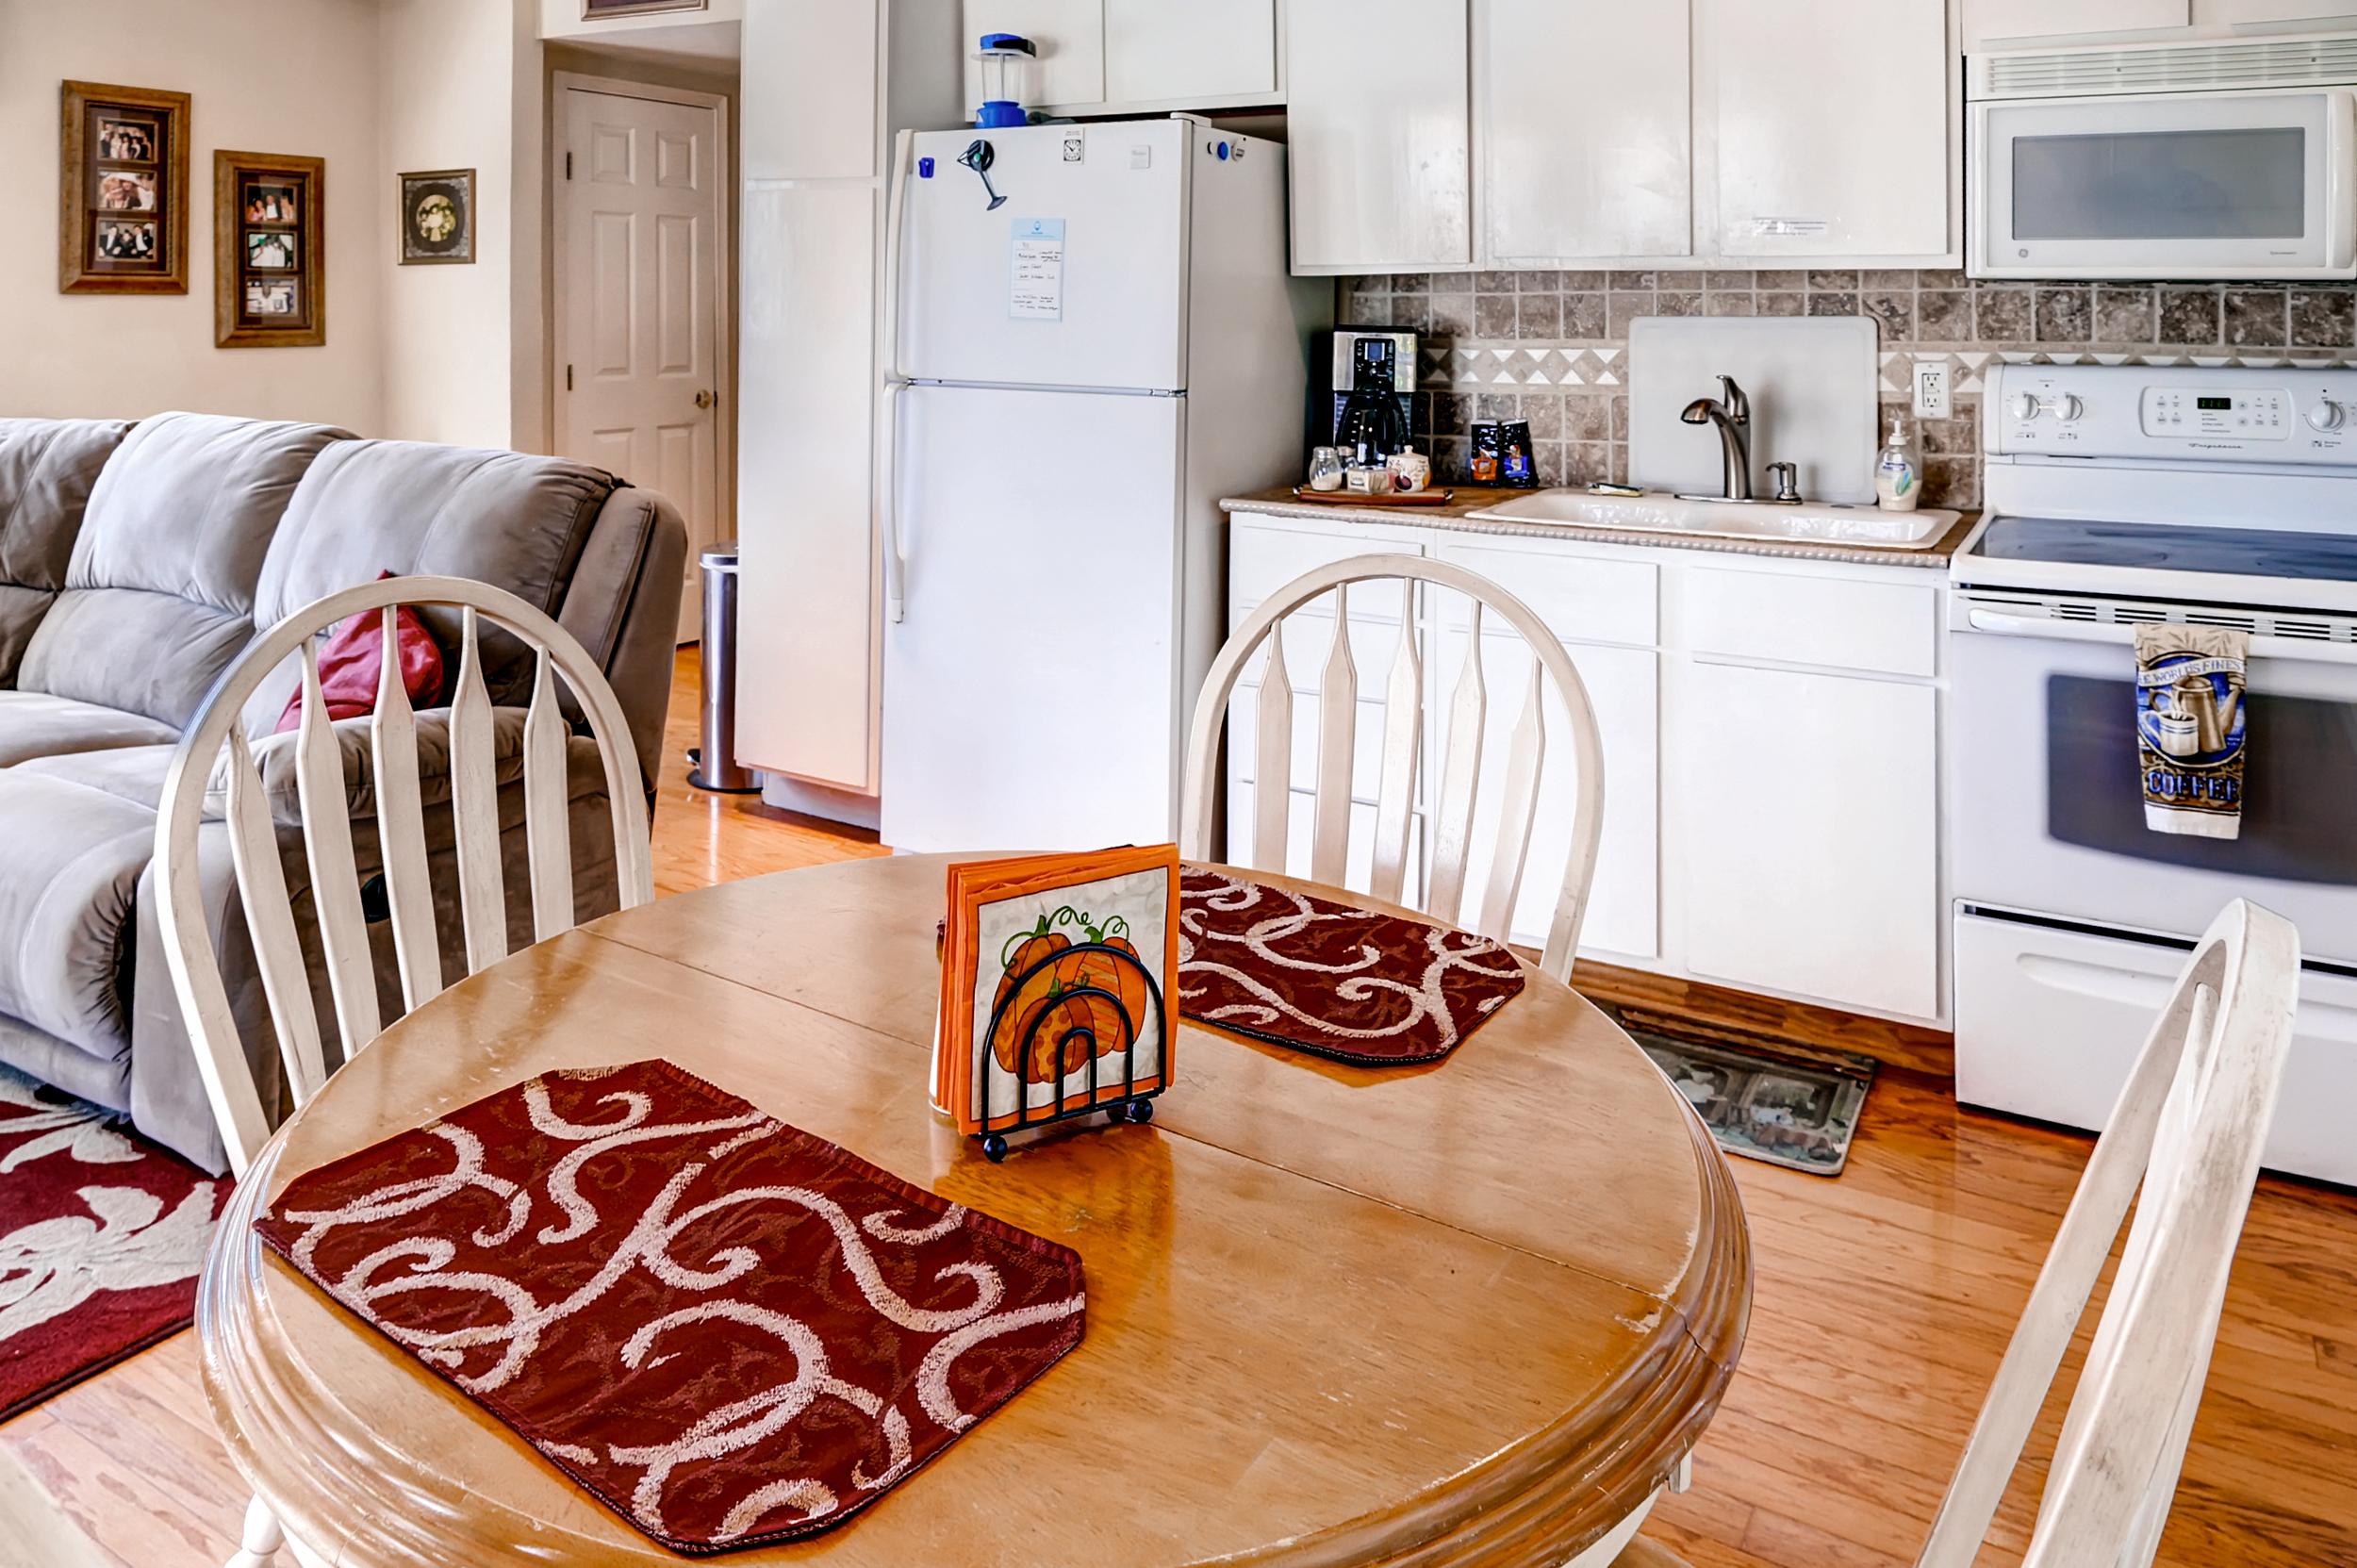 QuintilianiTamra - Kitchen (house 2) 2 - Copy.jpg